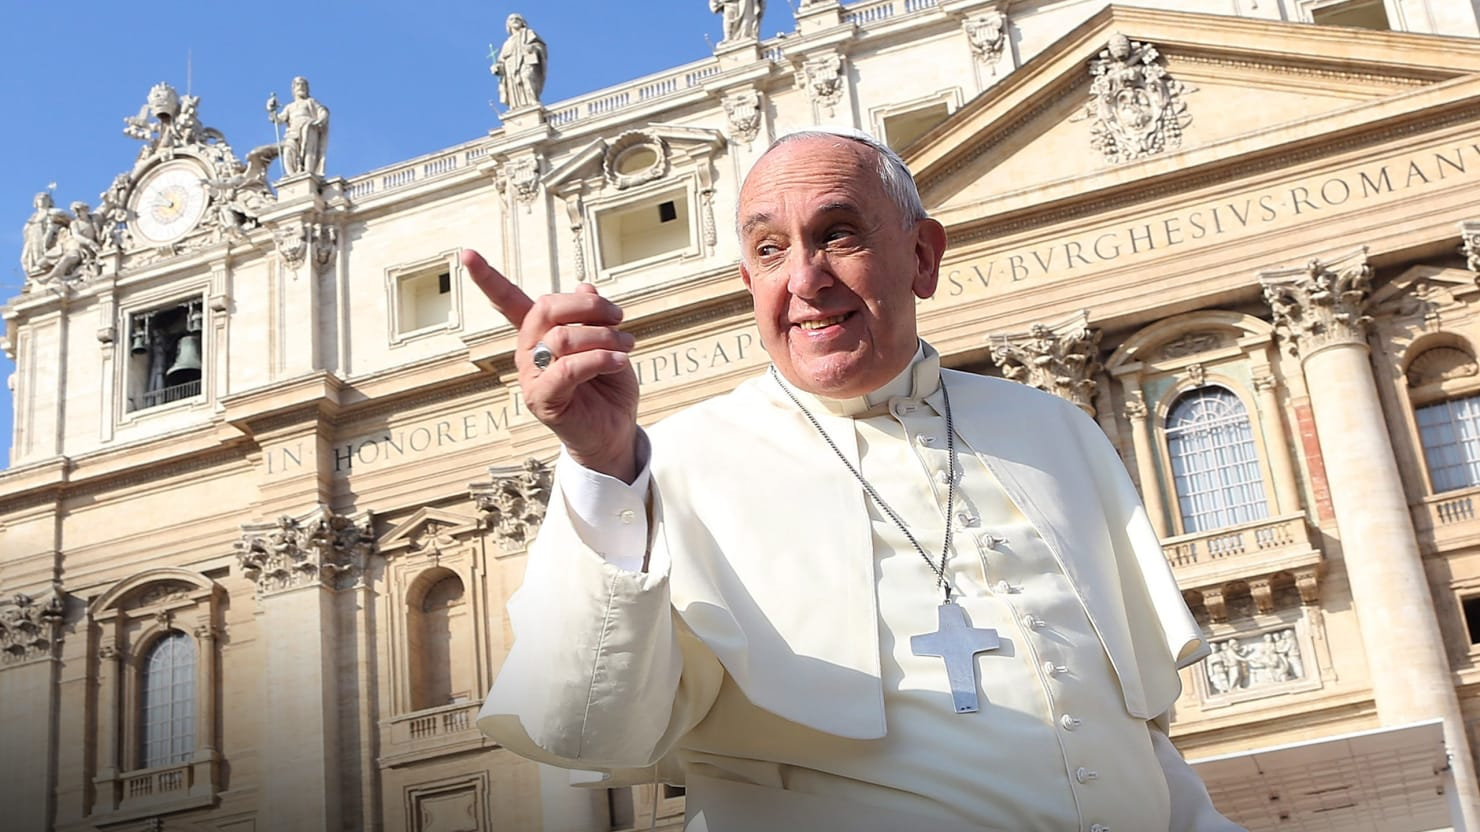 Catholic Church Says It's OK to be Gay, Sort Of